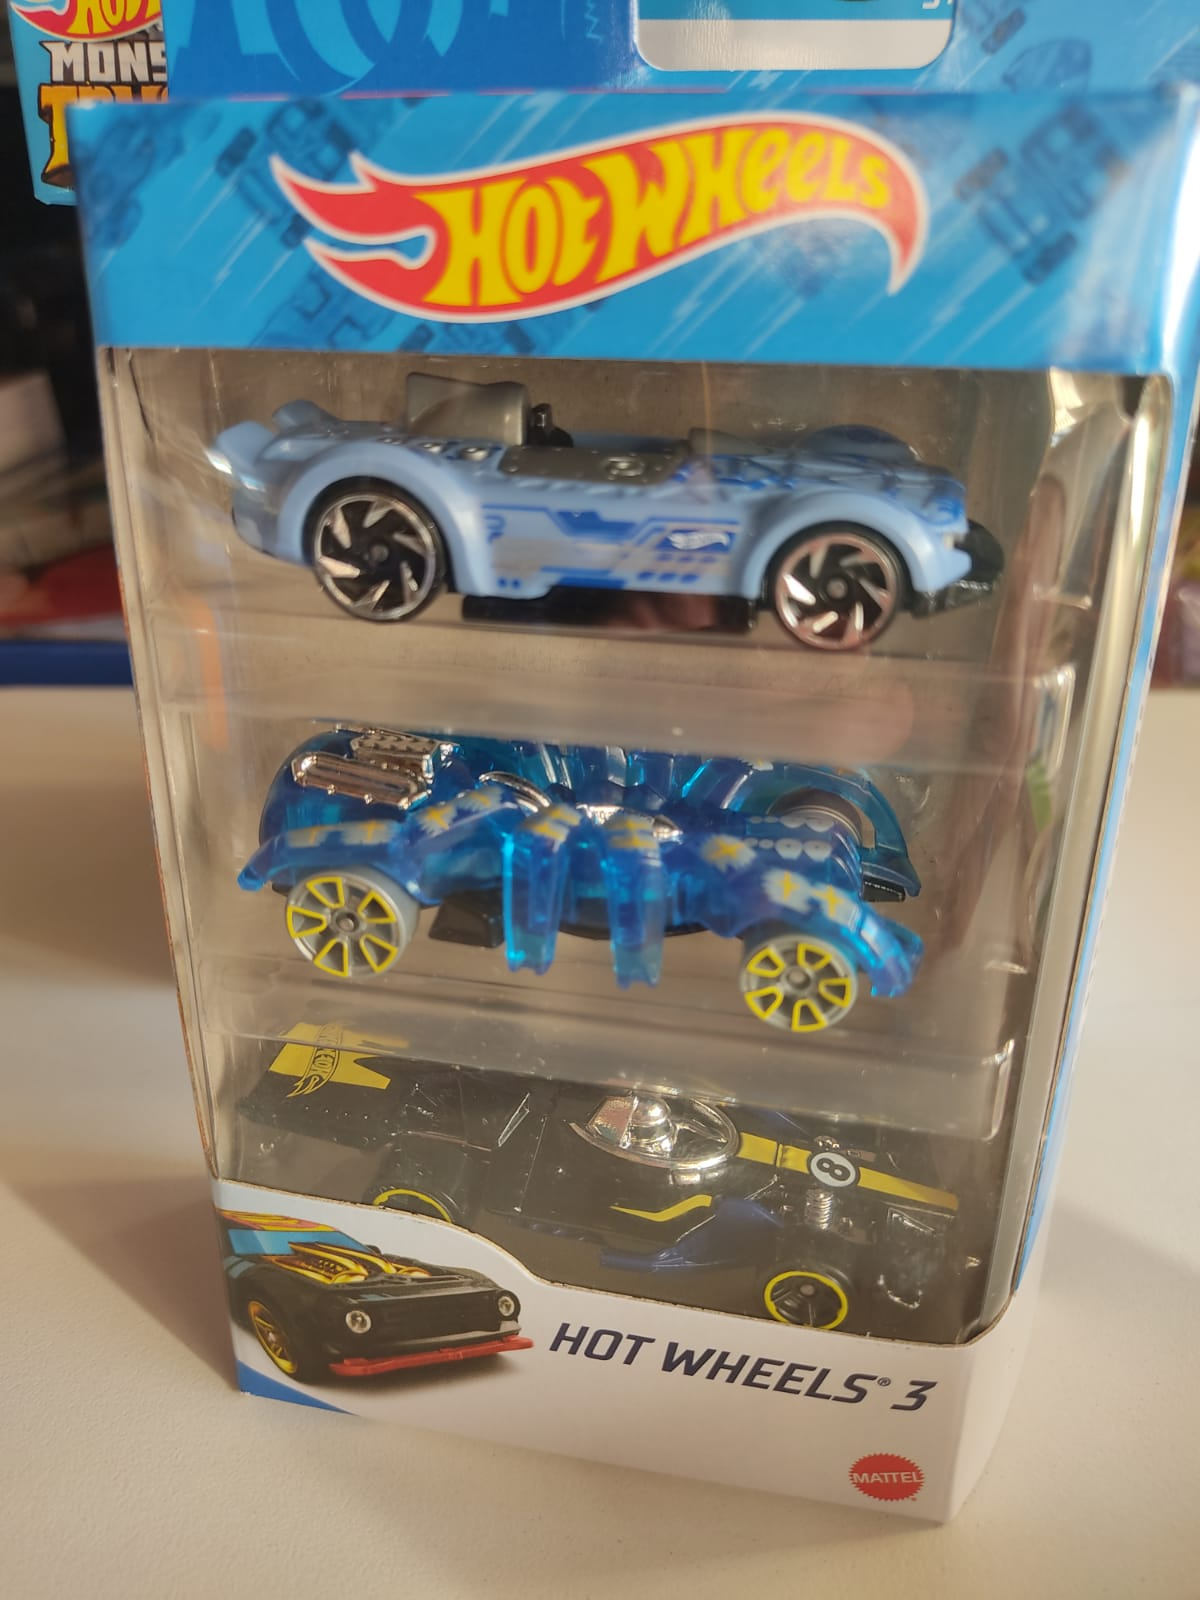 Carros Hot Wheels - Pacote 3 modelos